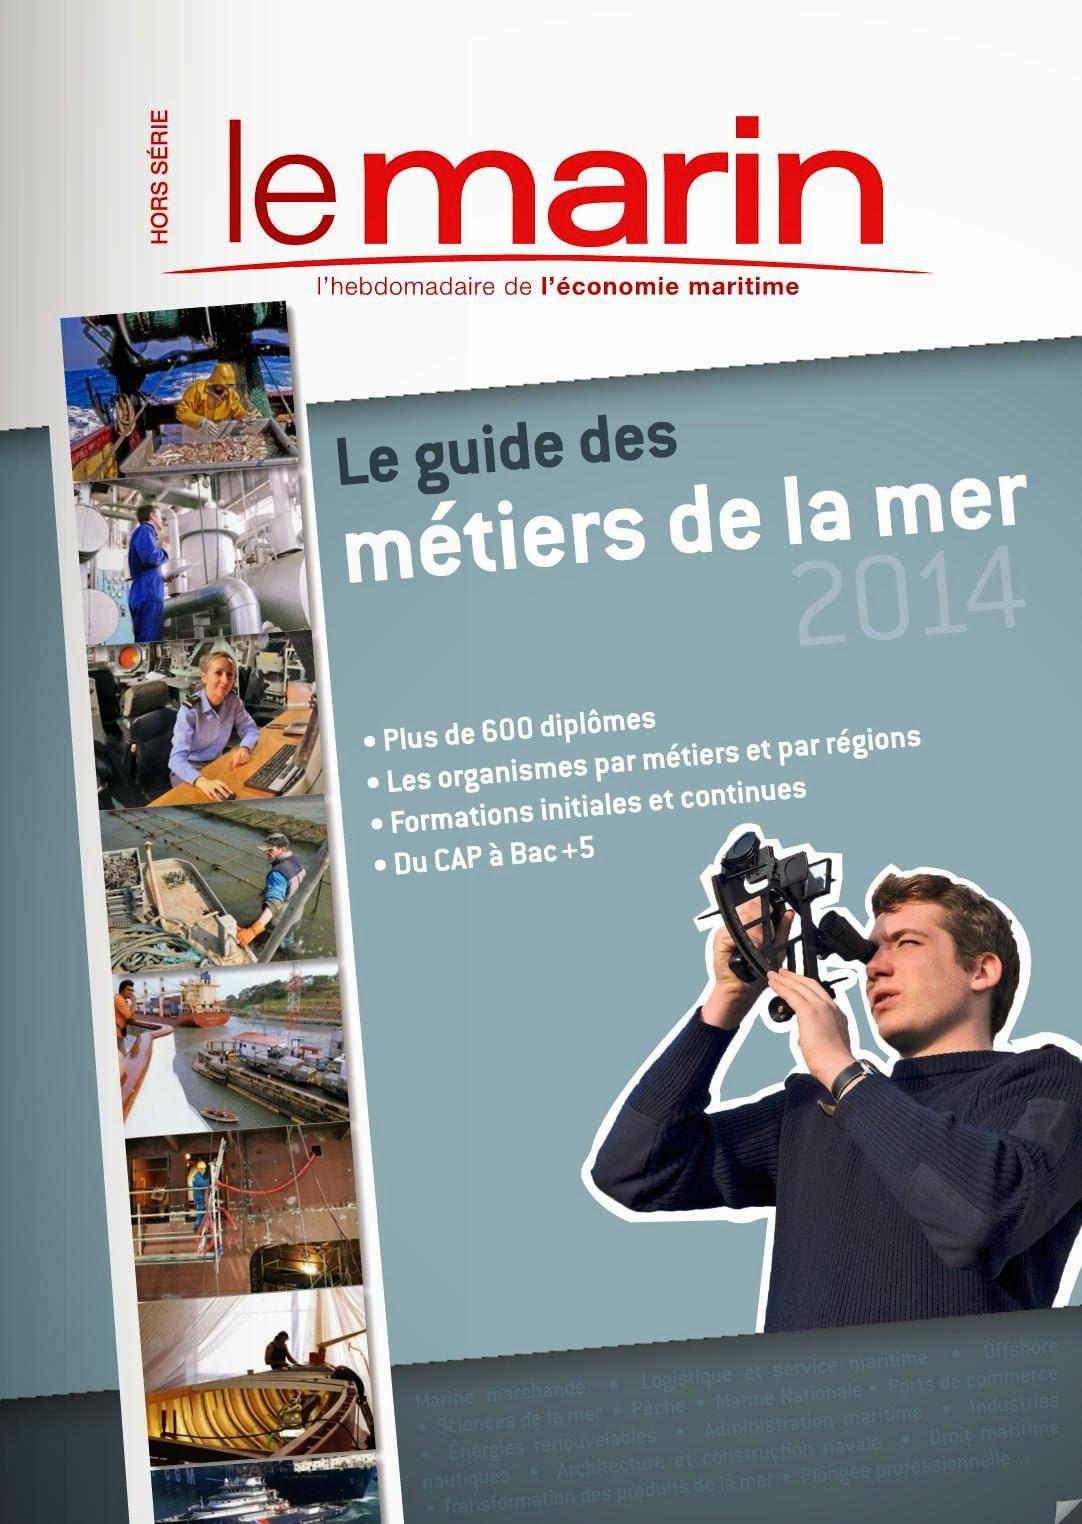 http://www.nxtbook.fr/lemarin/lemarin/DSGUIDEMETIERSDELAMER-OUV/index.php